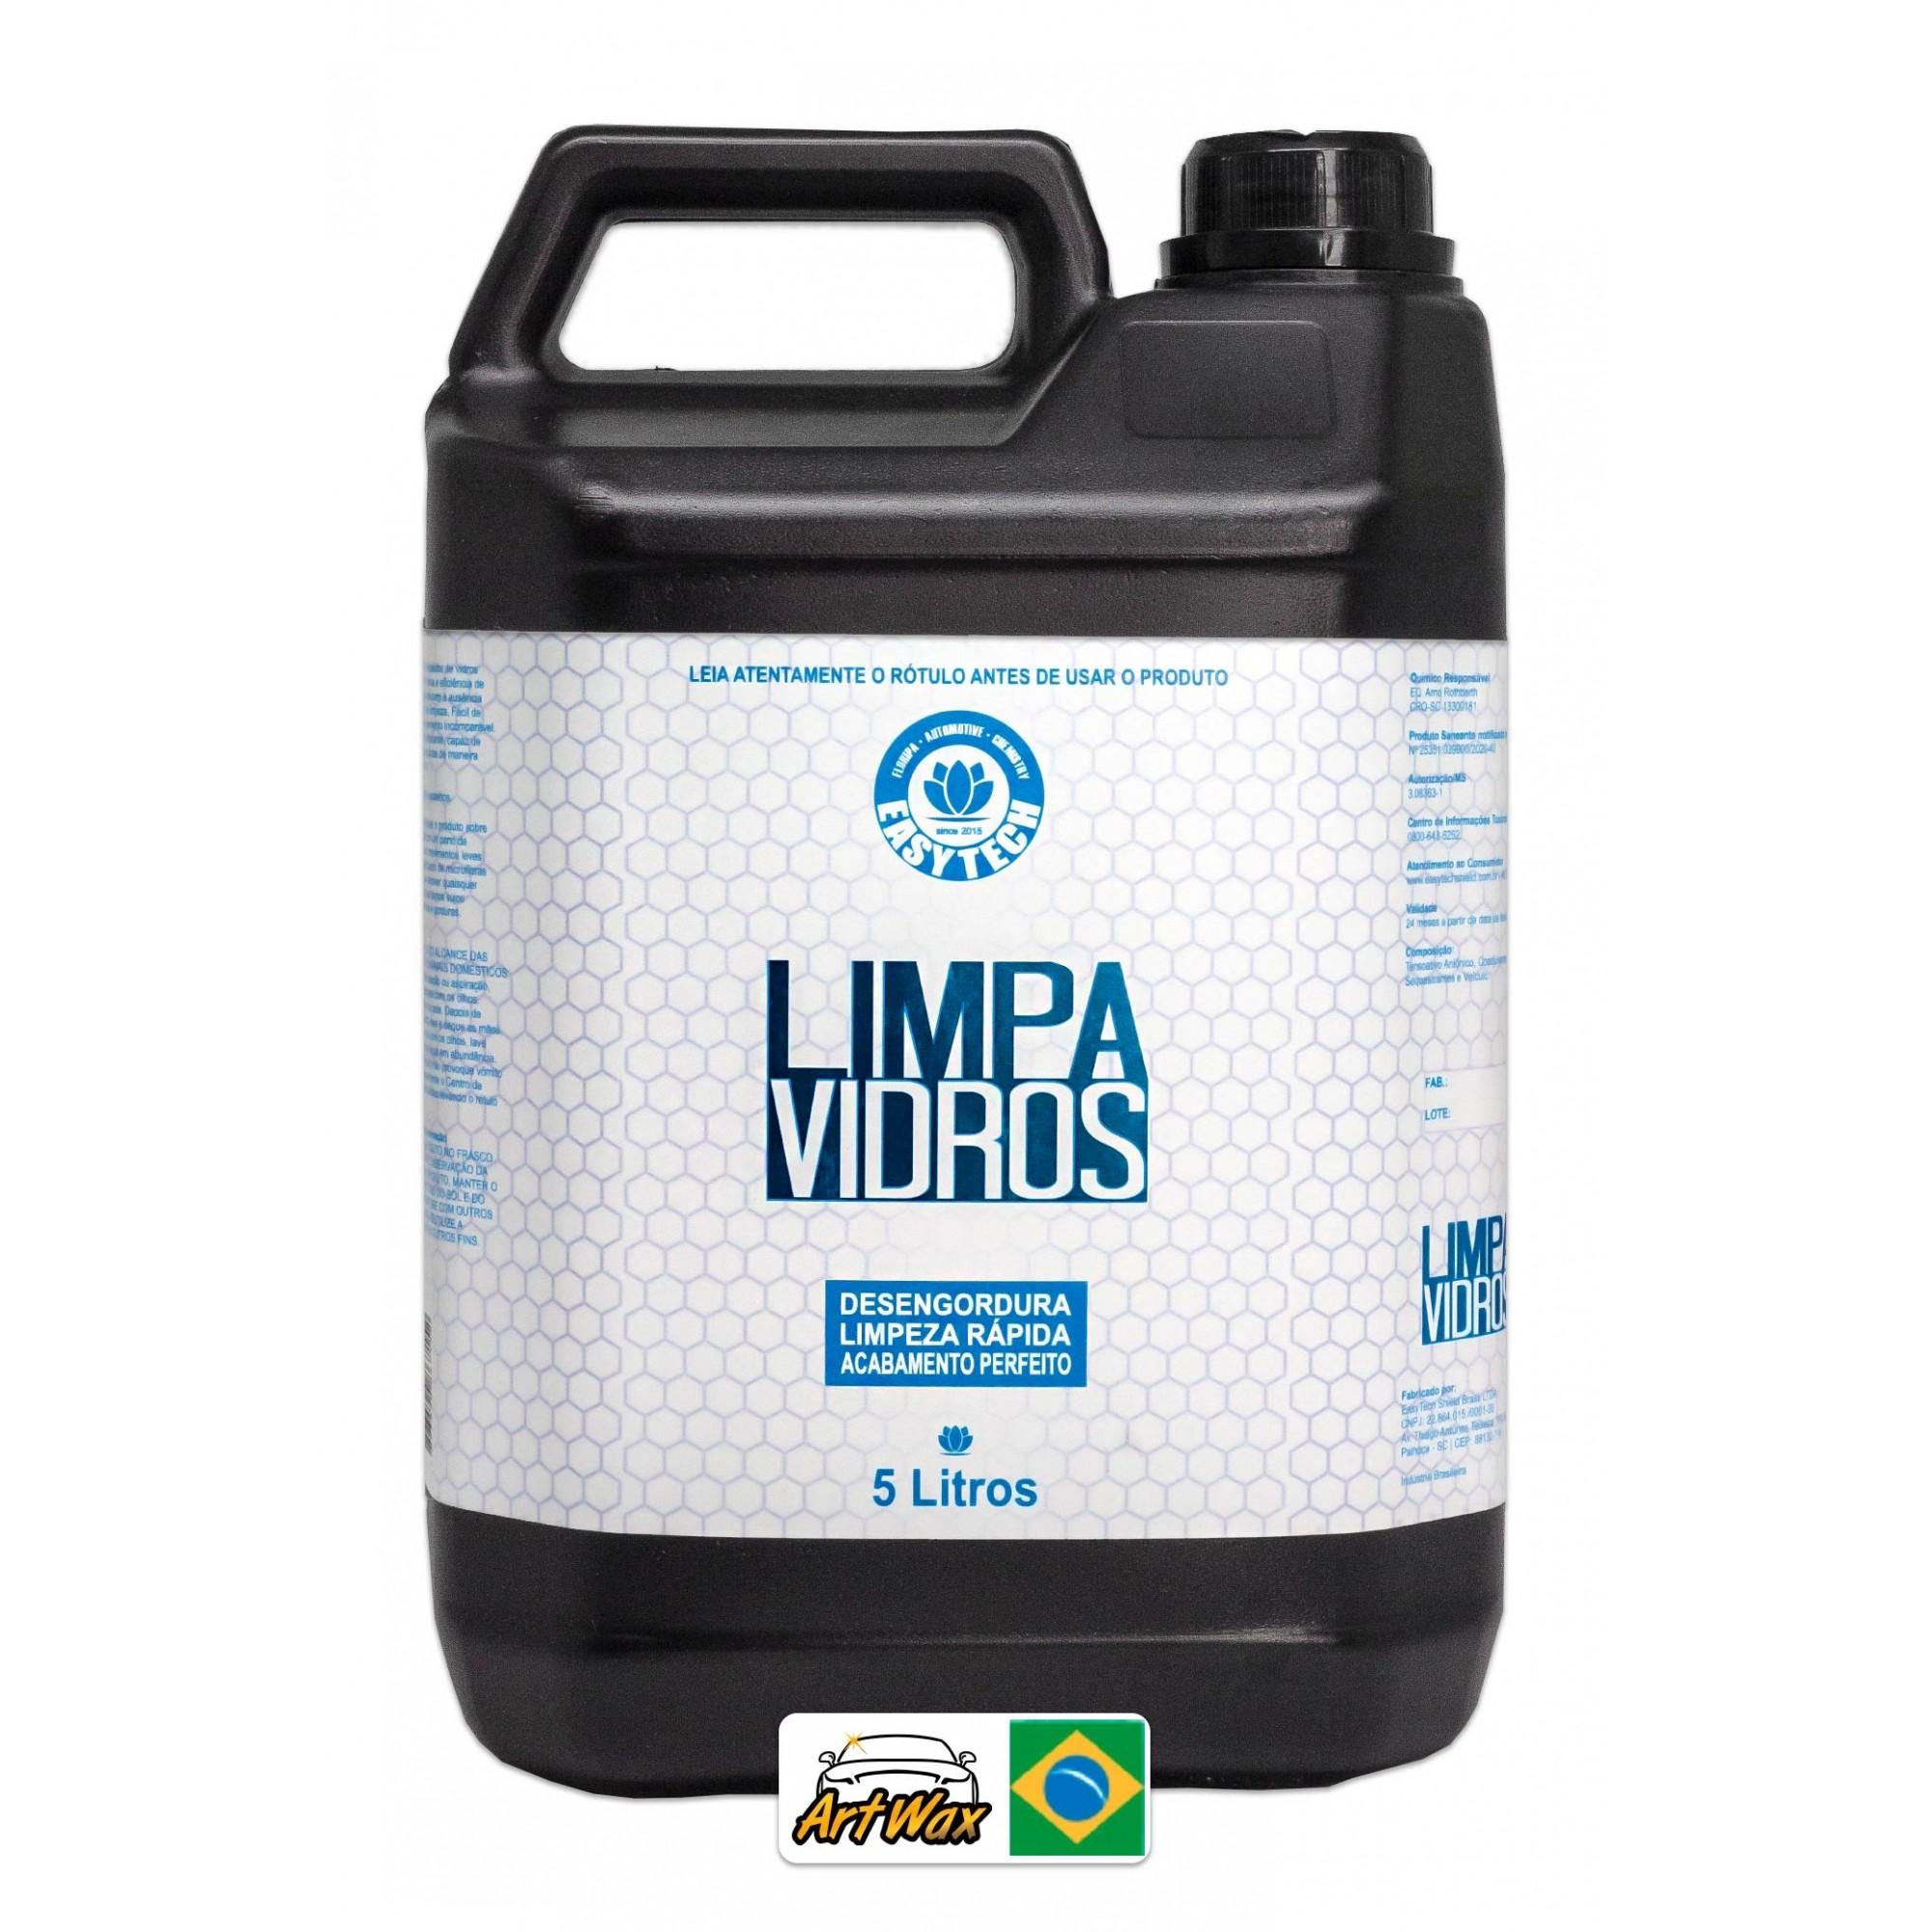 Easytech Limpa Vidros 5L - Desengordurante